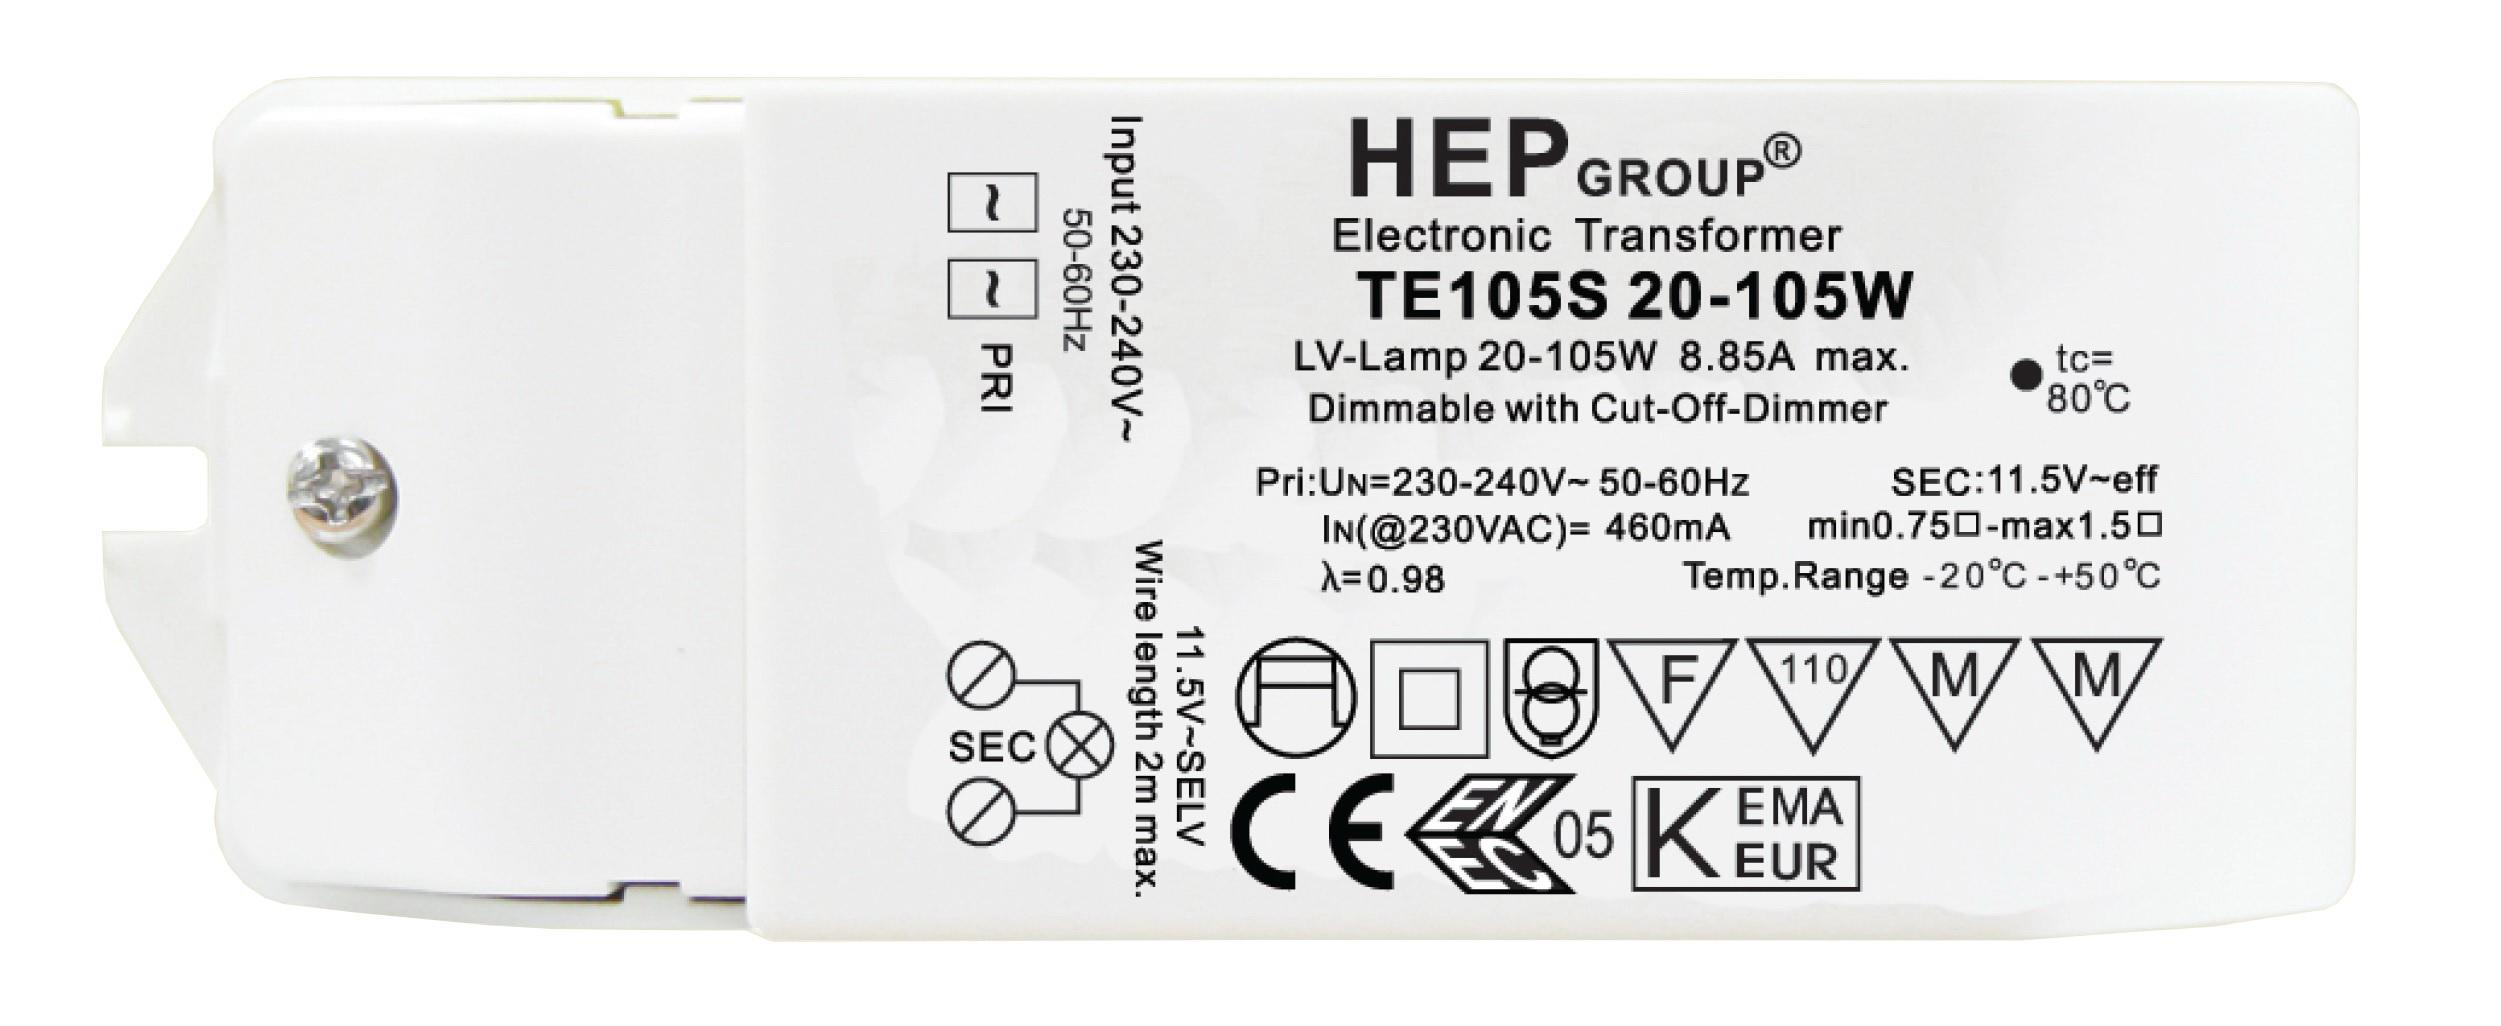 1 Stk Elektronischer Transformator, 240/12V, 20-105VA, Dimm LI5ZTE105S